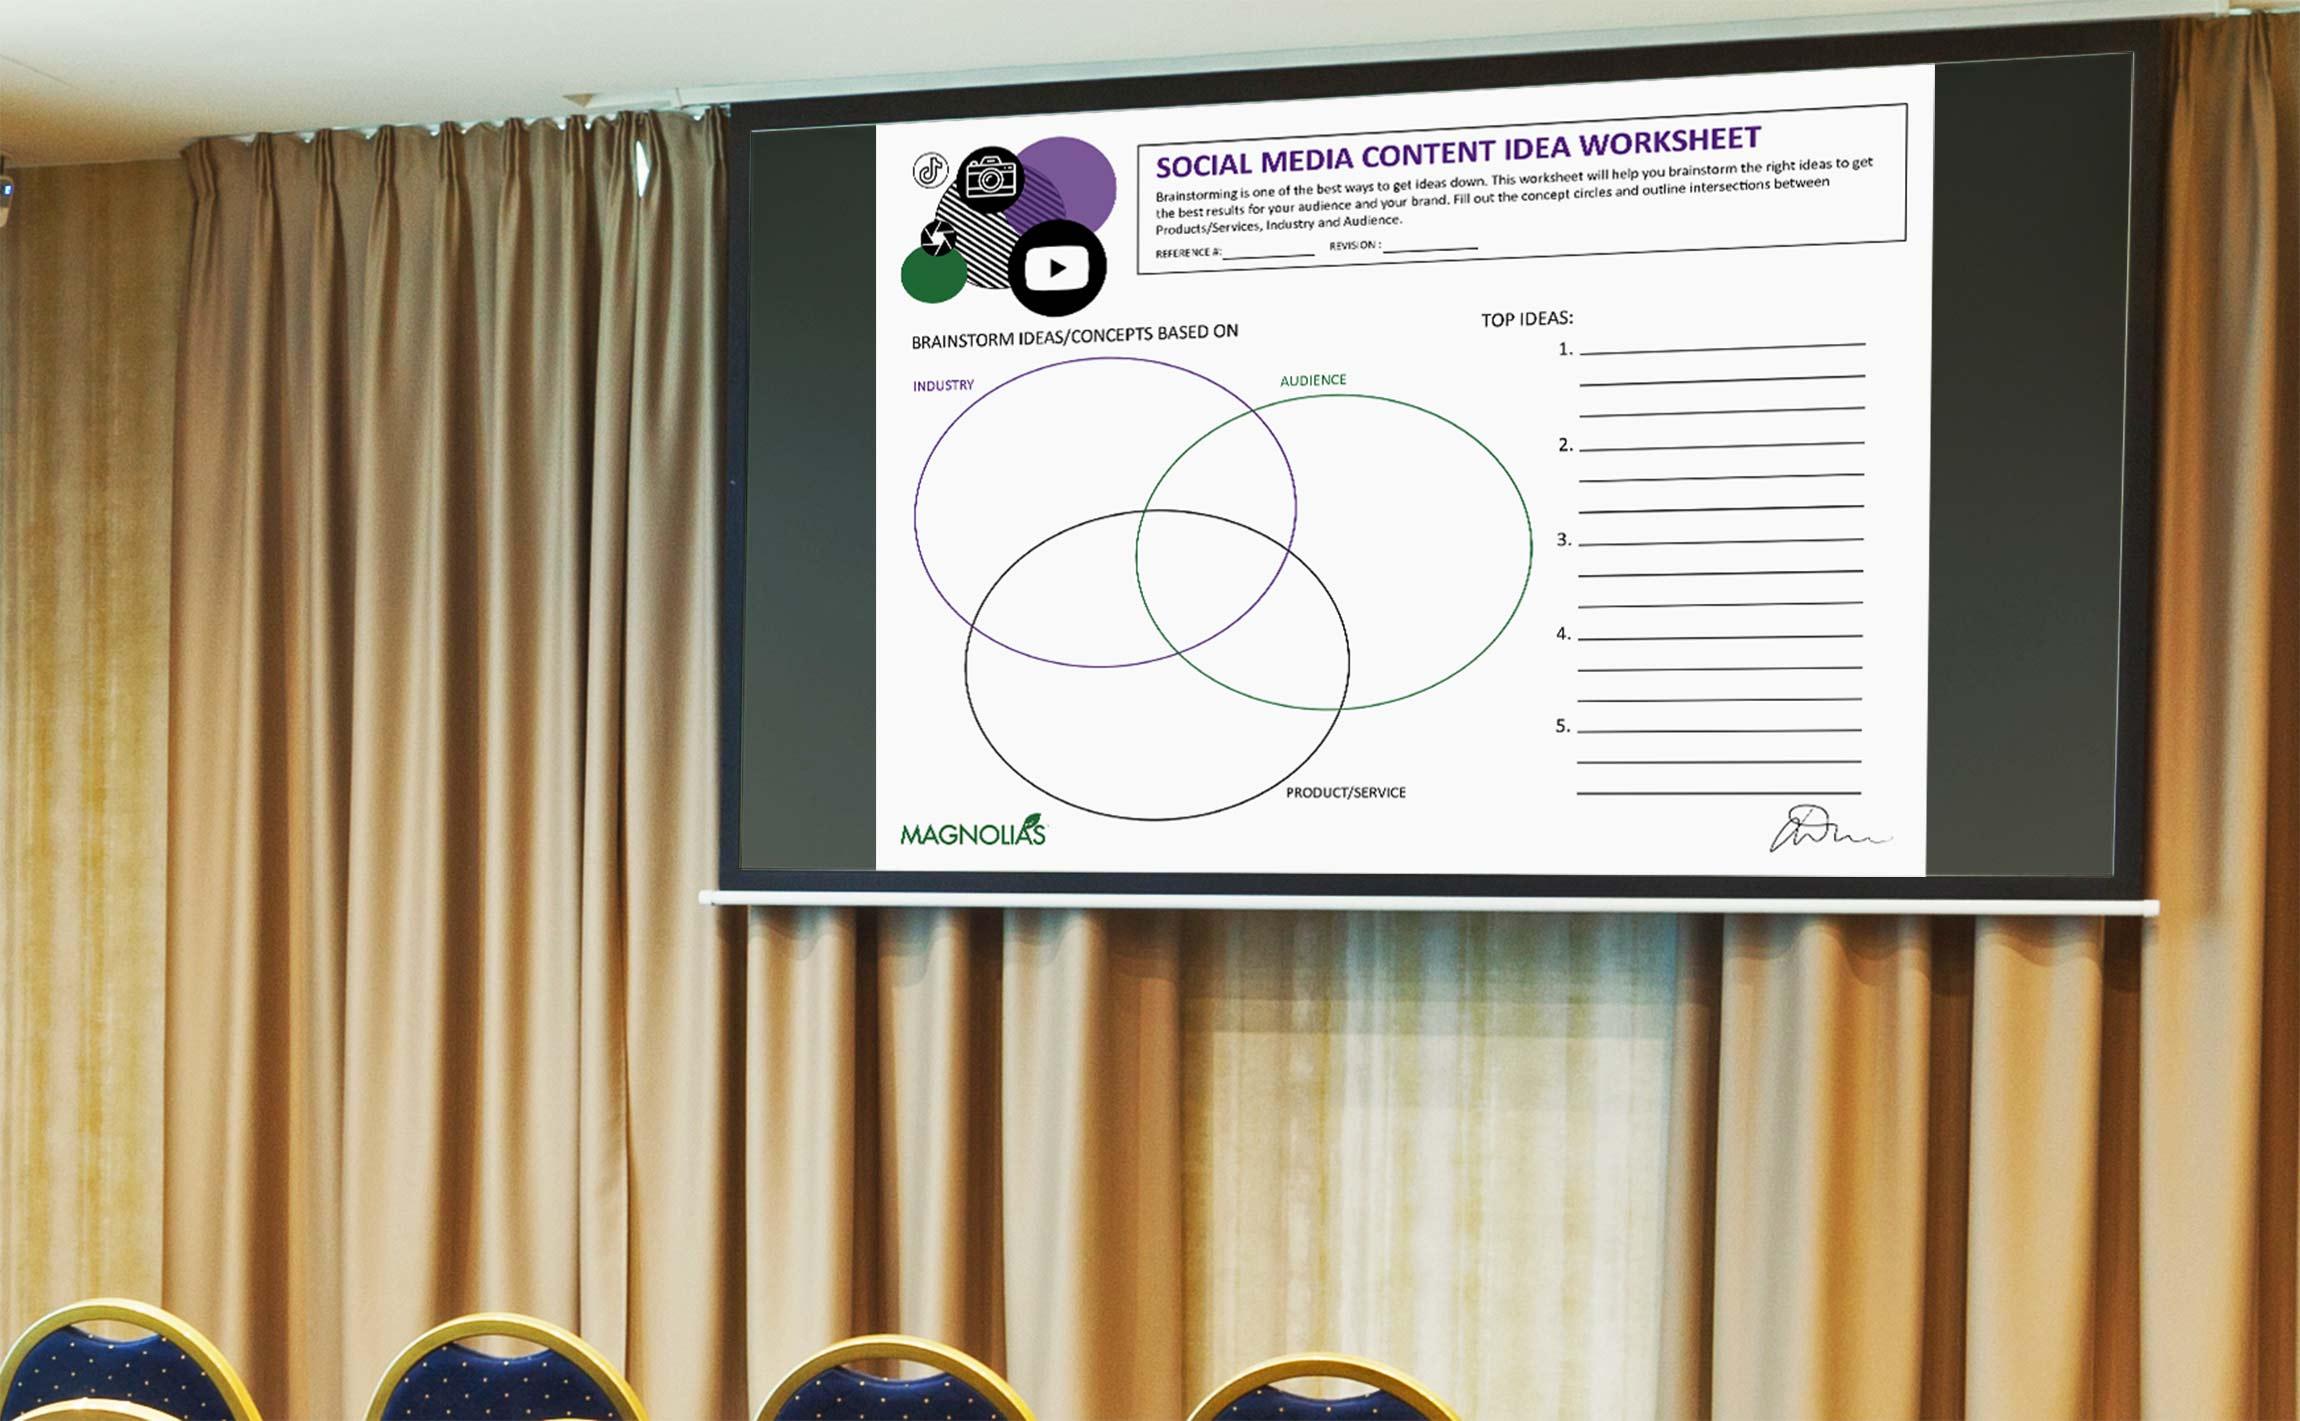 Social Media Content Planning Worksheet